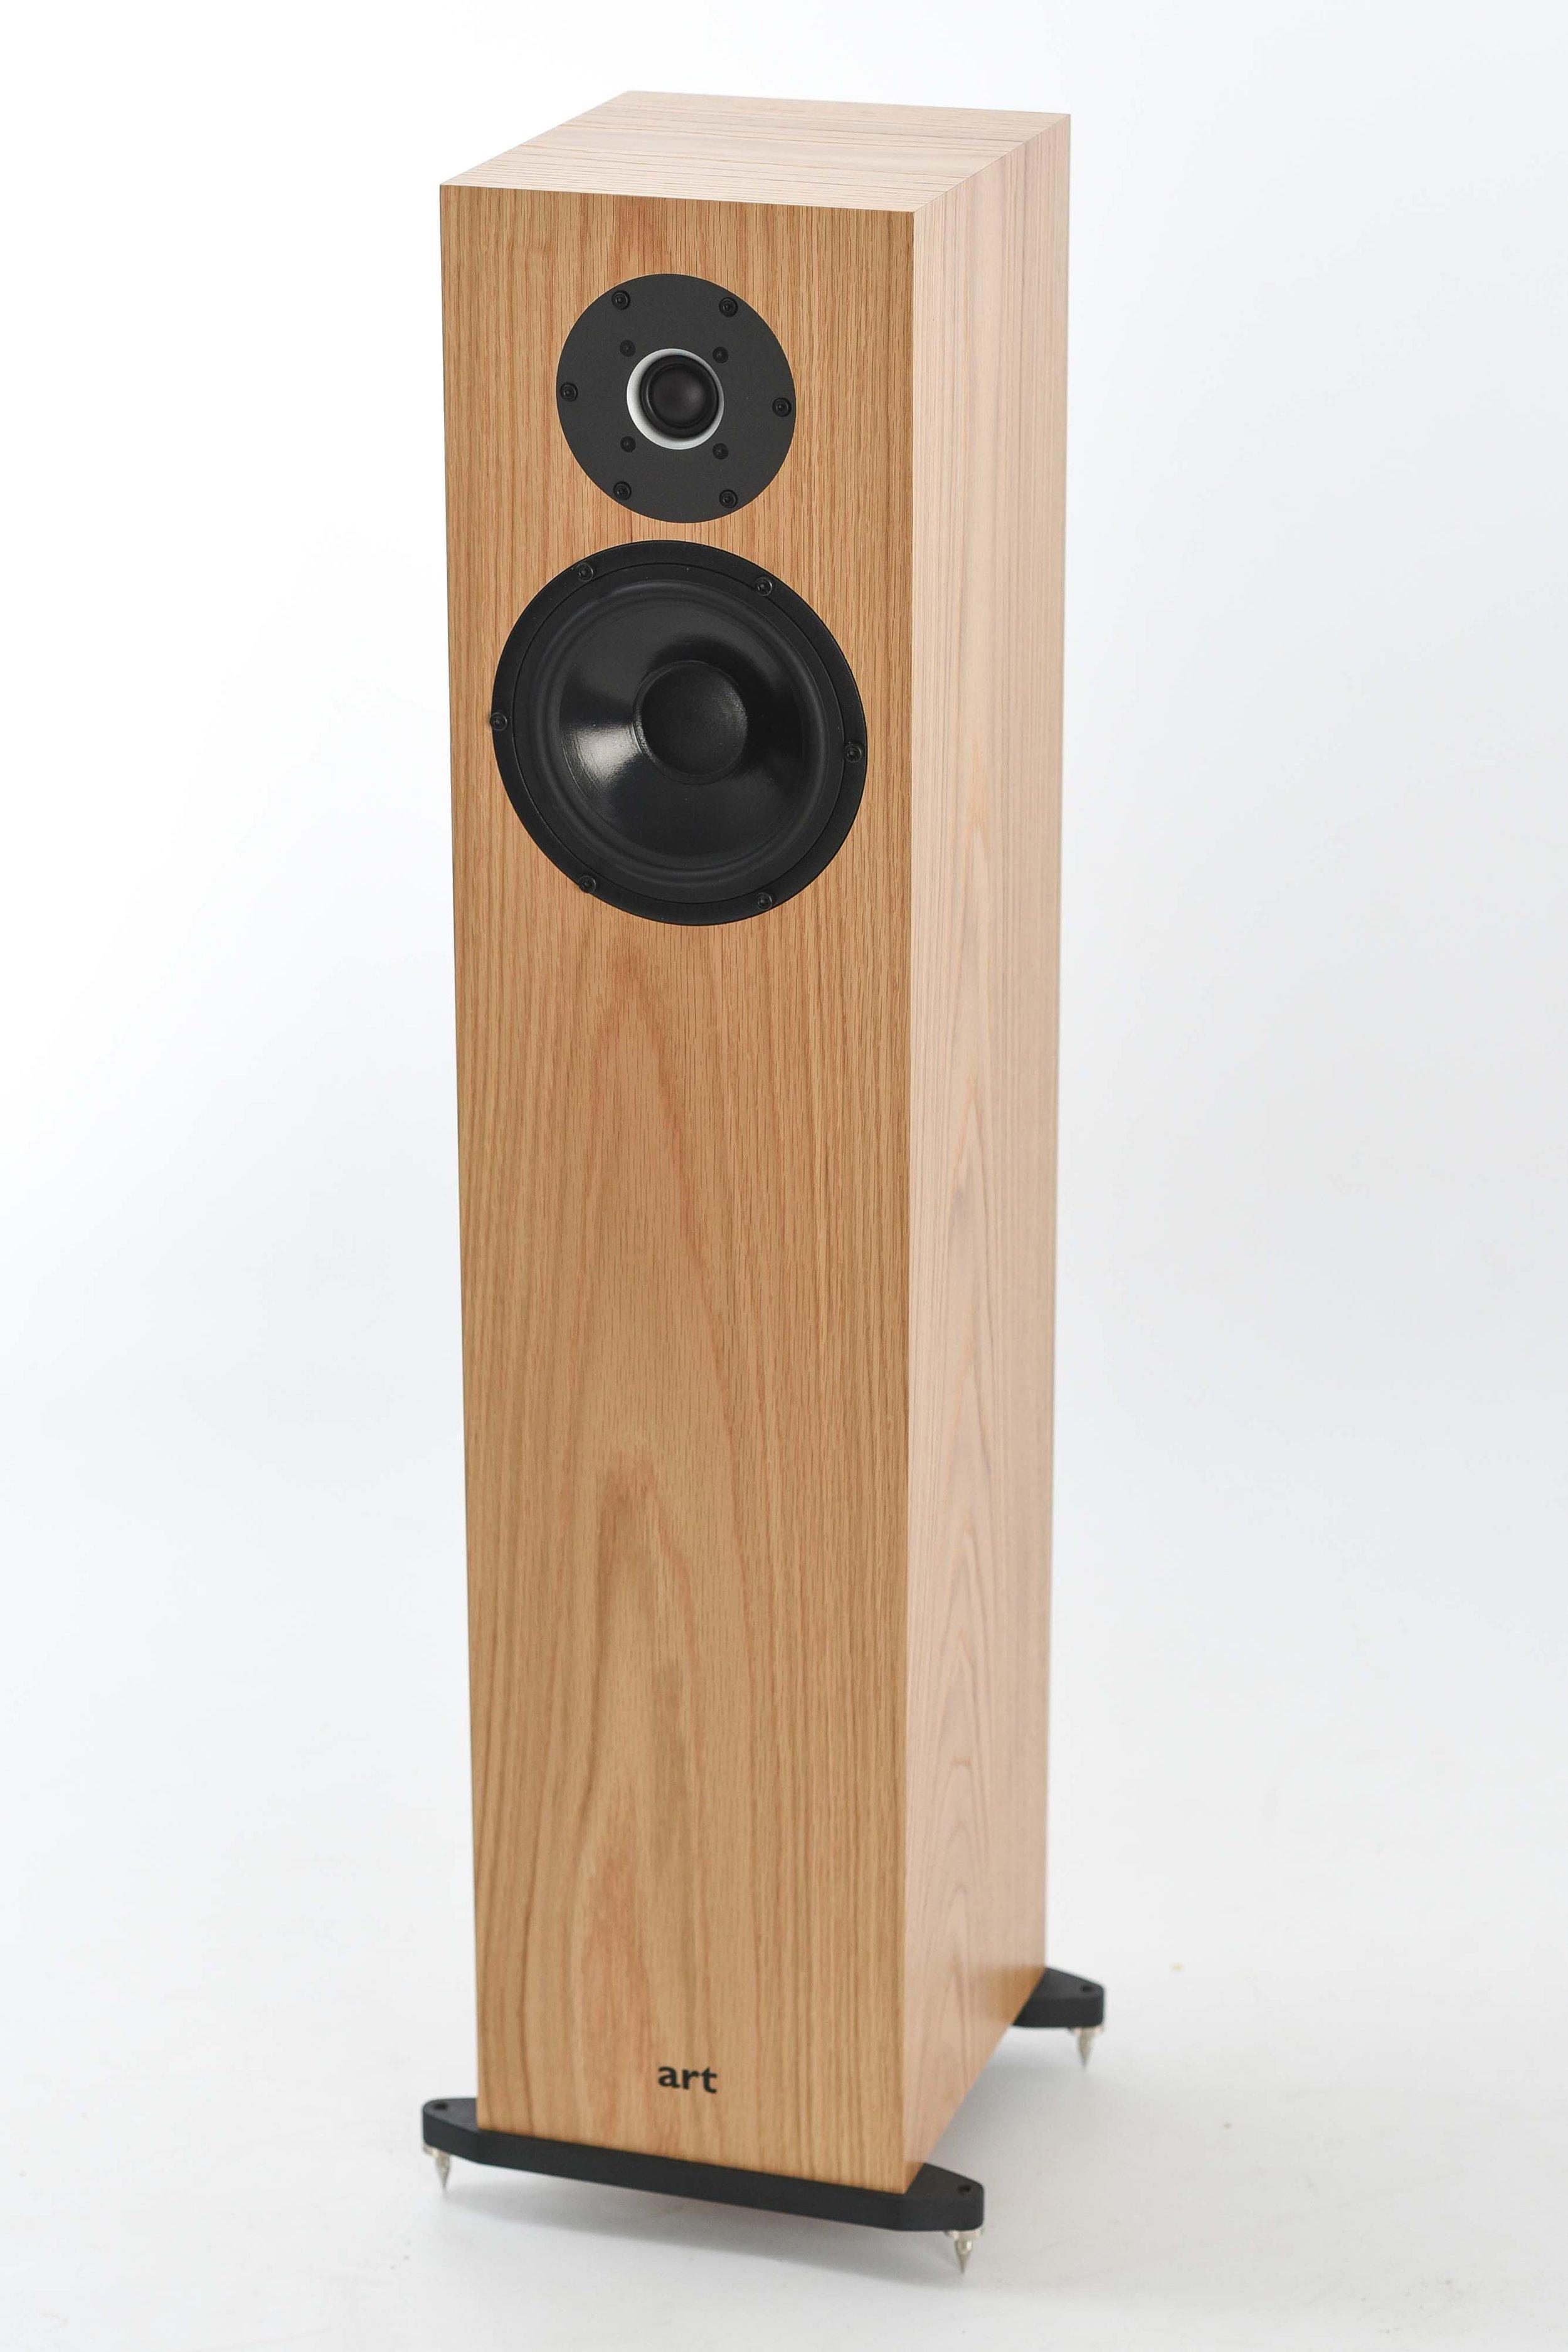 <b>ART Stiletto 6 Speakers</b>